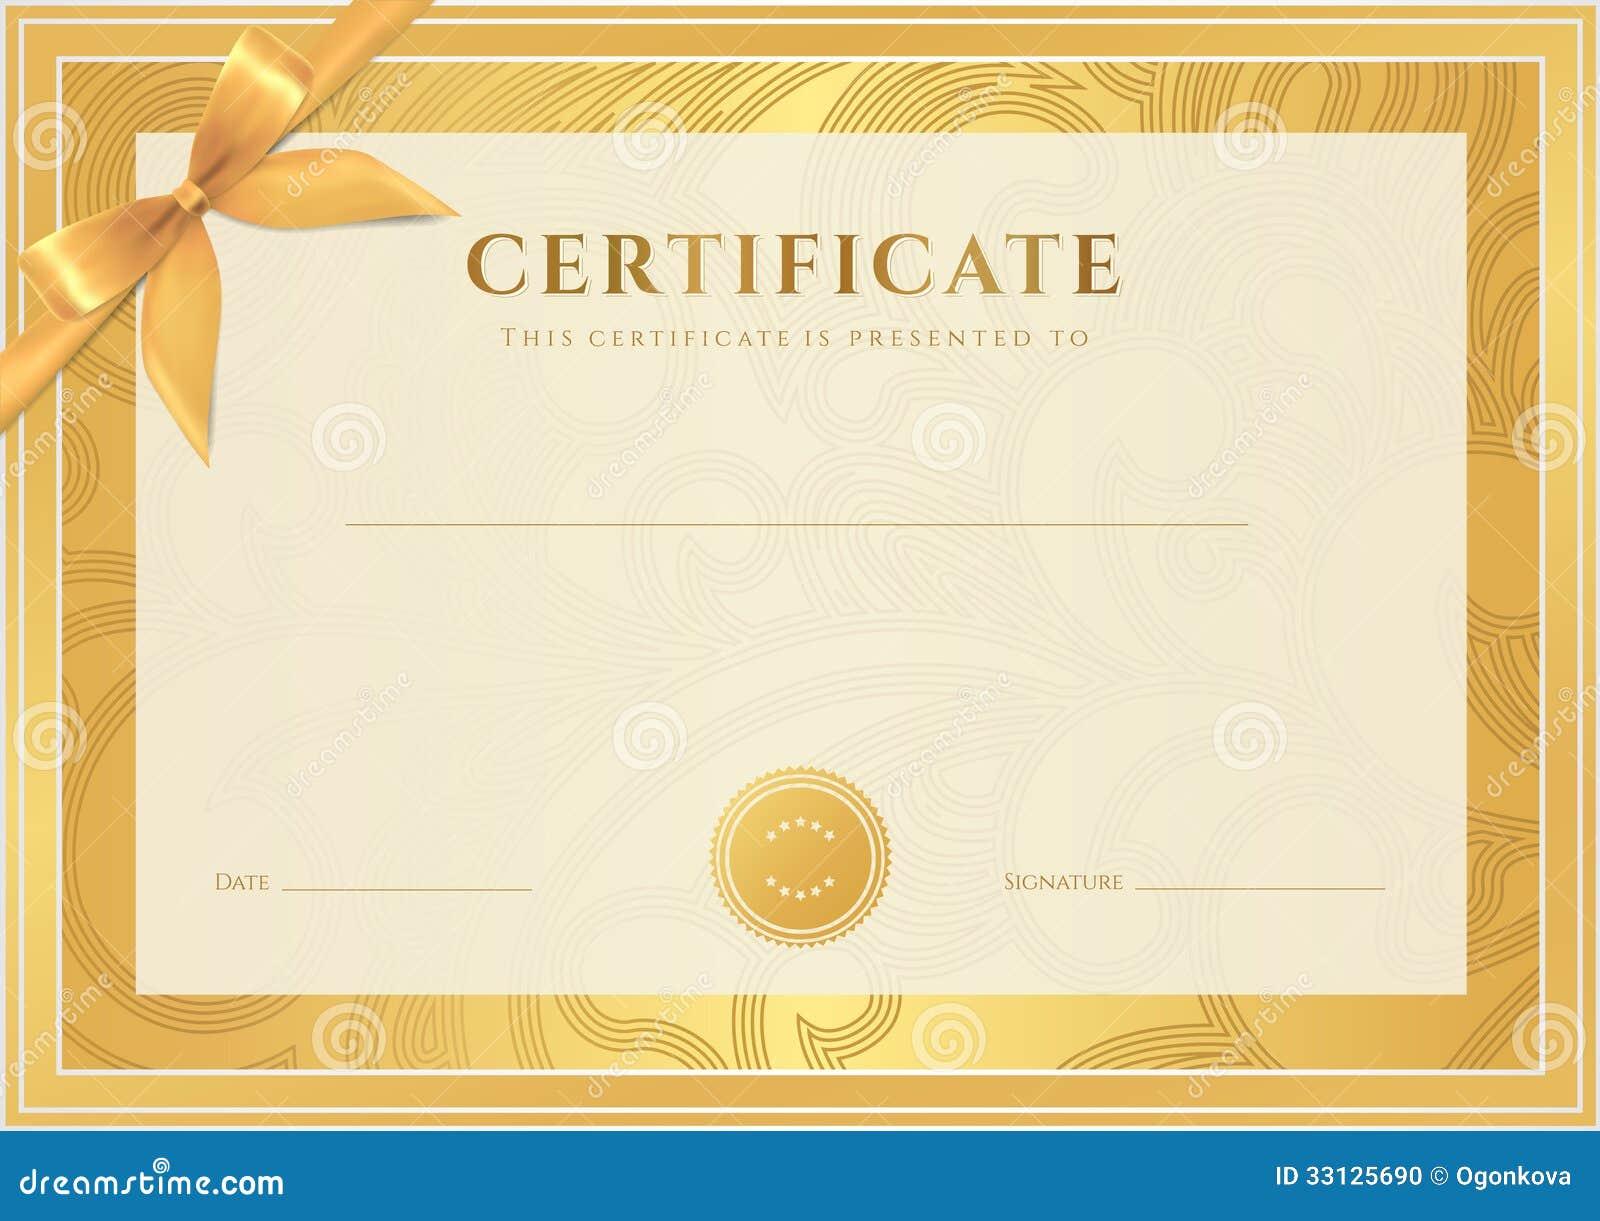 Gold Award Template Certificate Borders